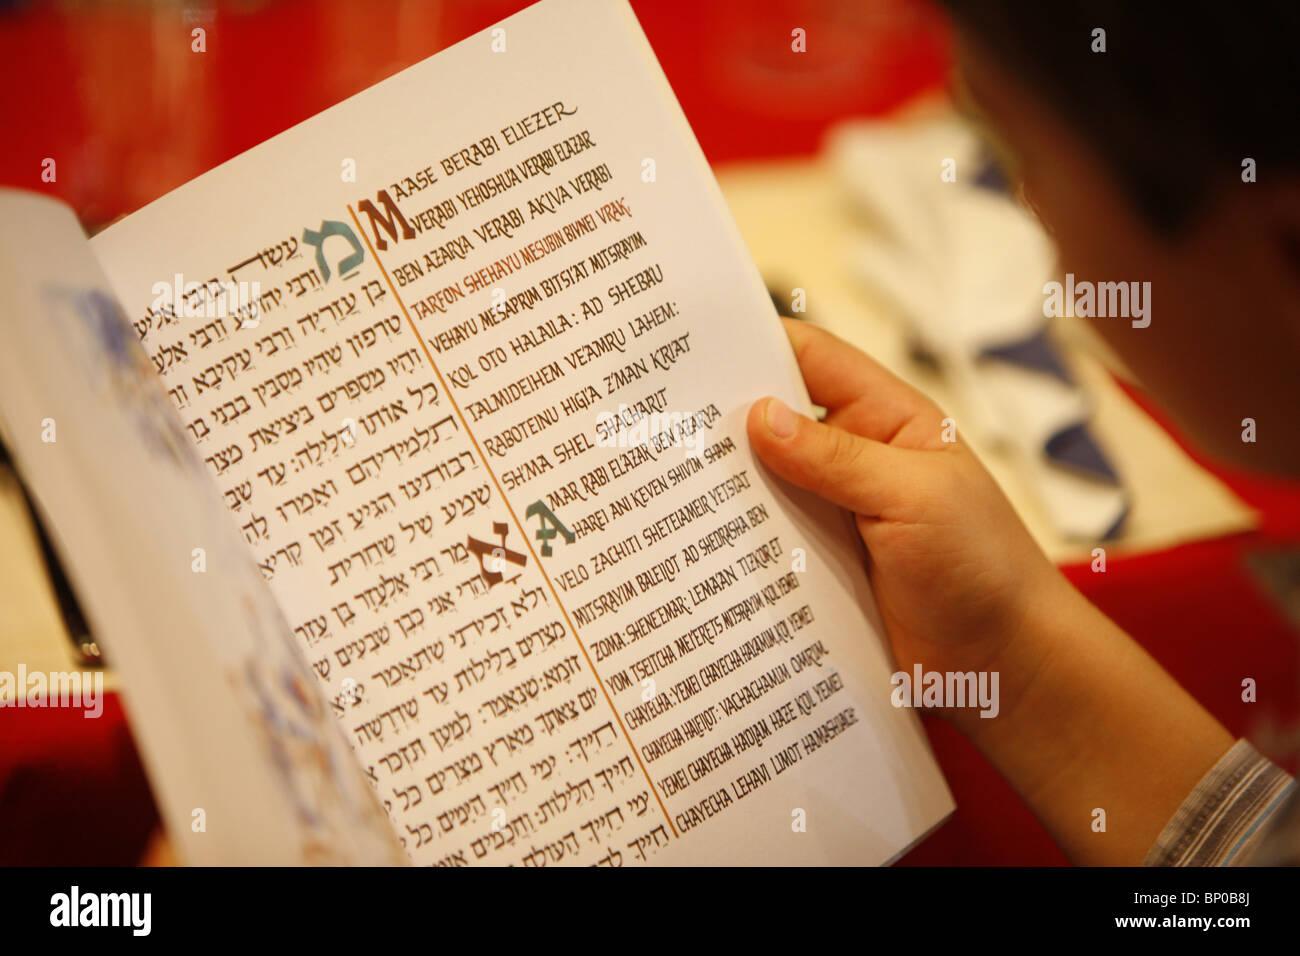 France, Paris, Pessah Haggada reading - Stock Image